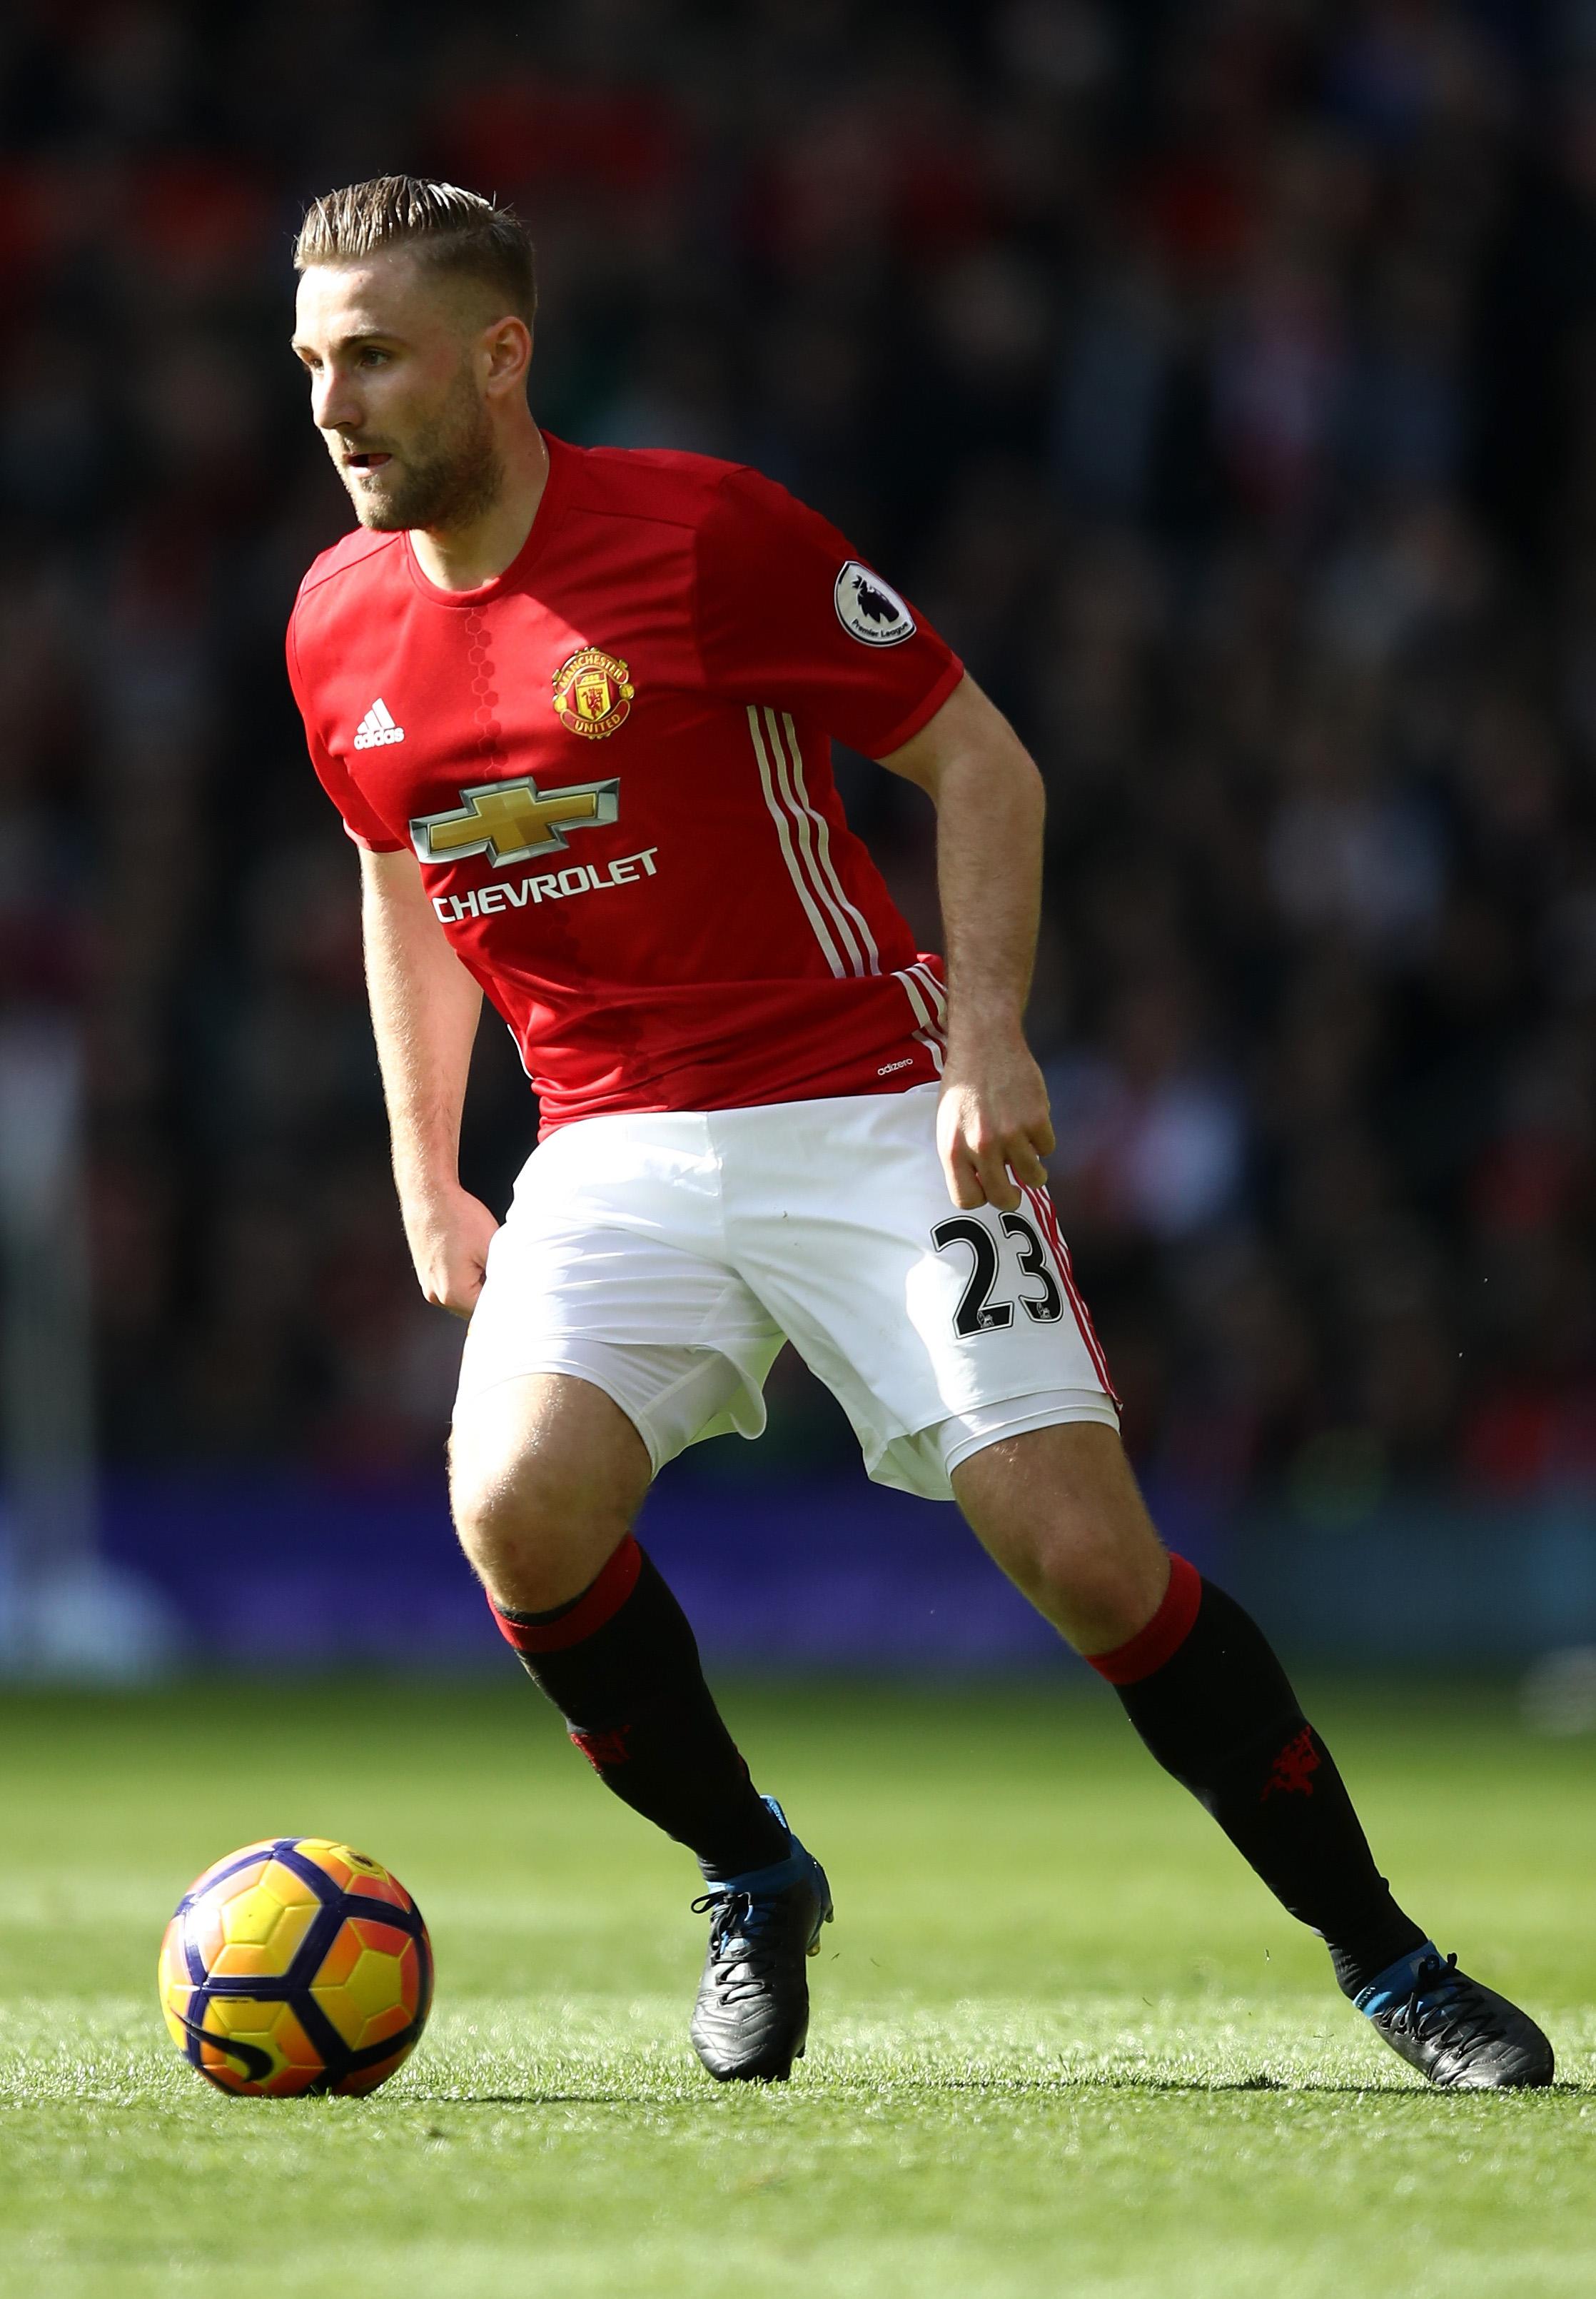 Luke Shaw not fit enough according to Jose Mourinho